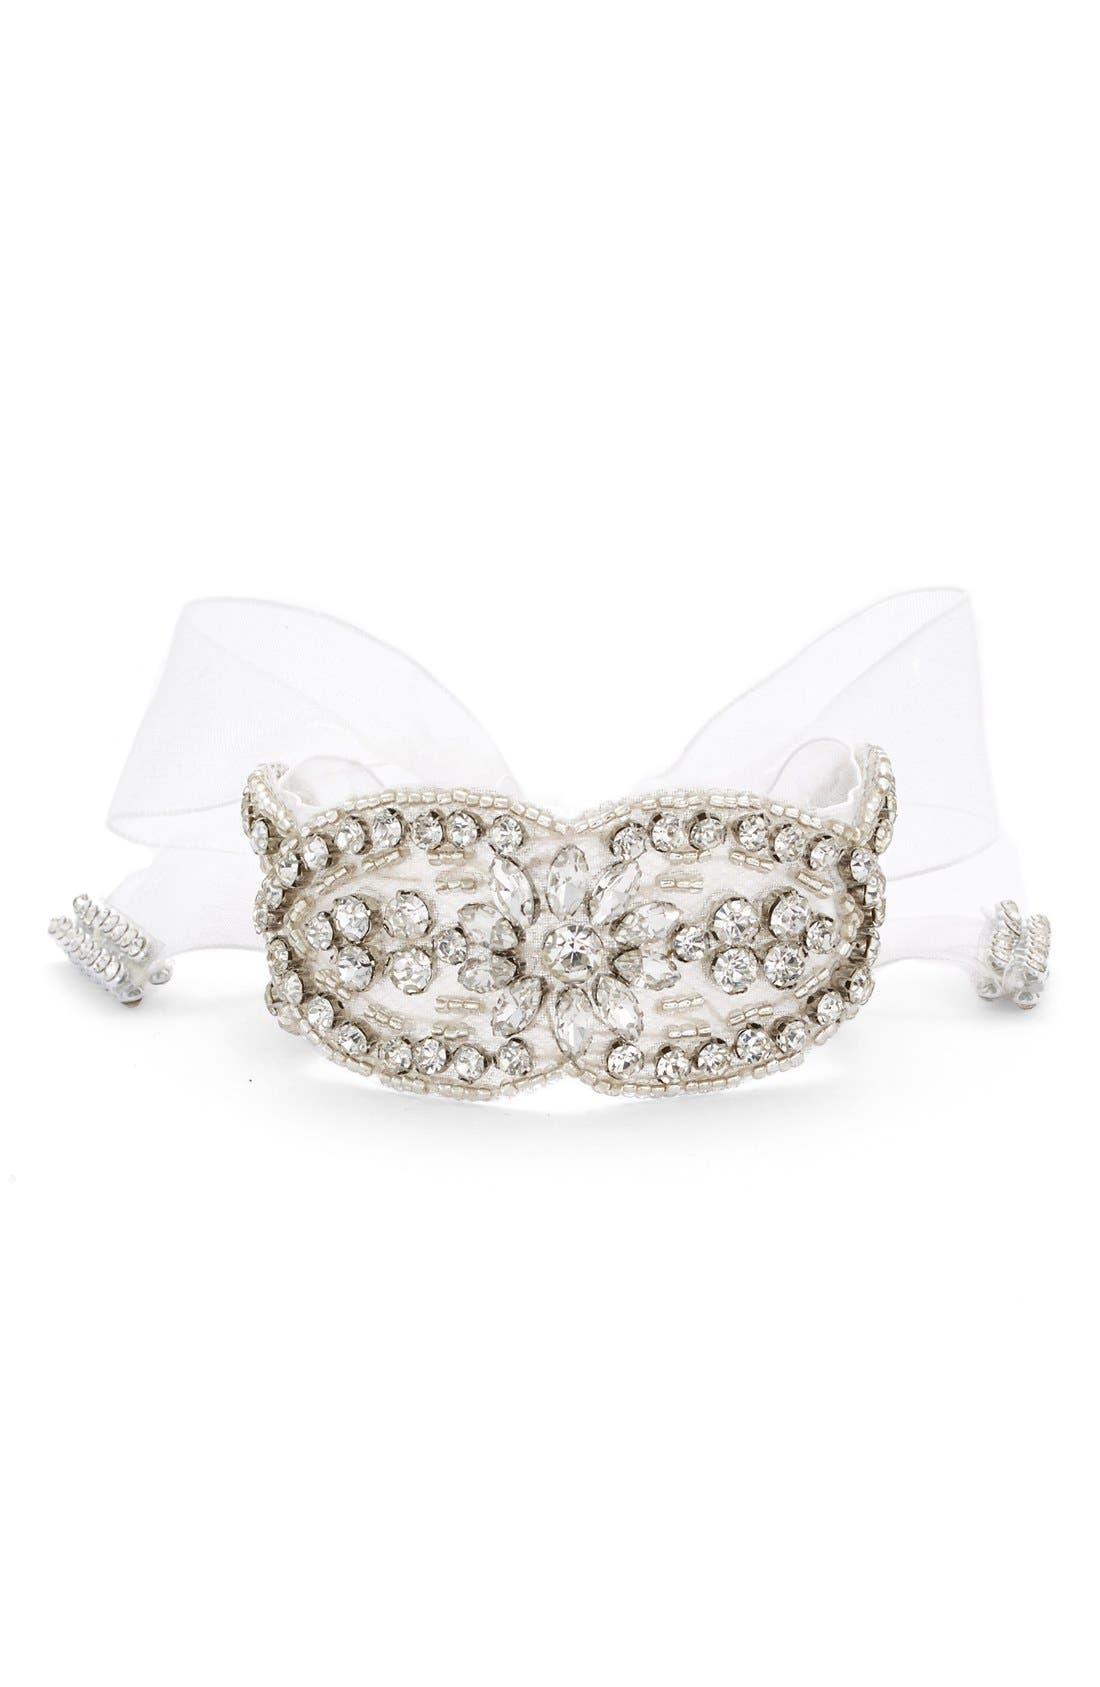 Main Image - Nina 'Pretty Boho' Jewel Tie Bracelet